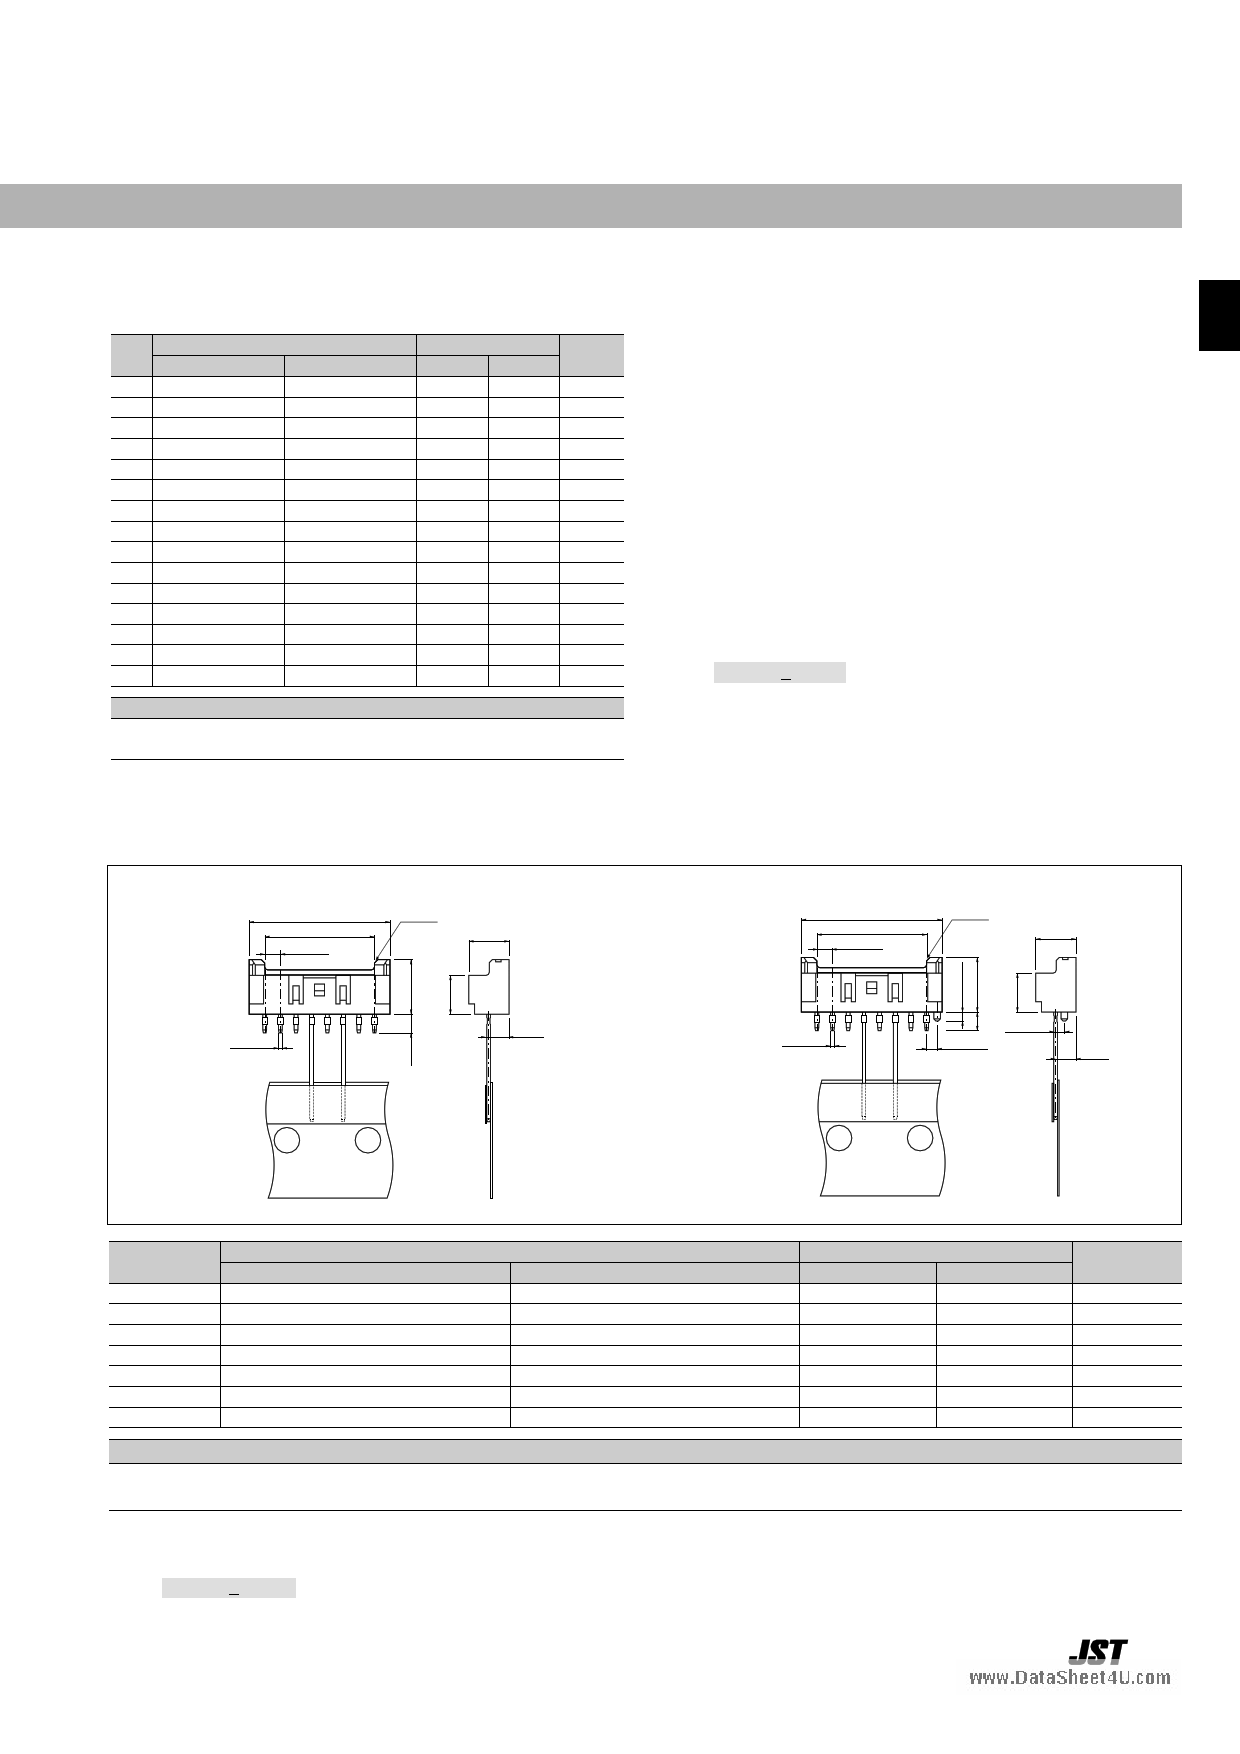 B03B-XASK-1N pdf, arduino